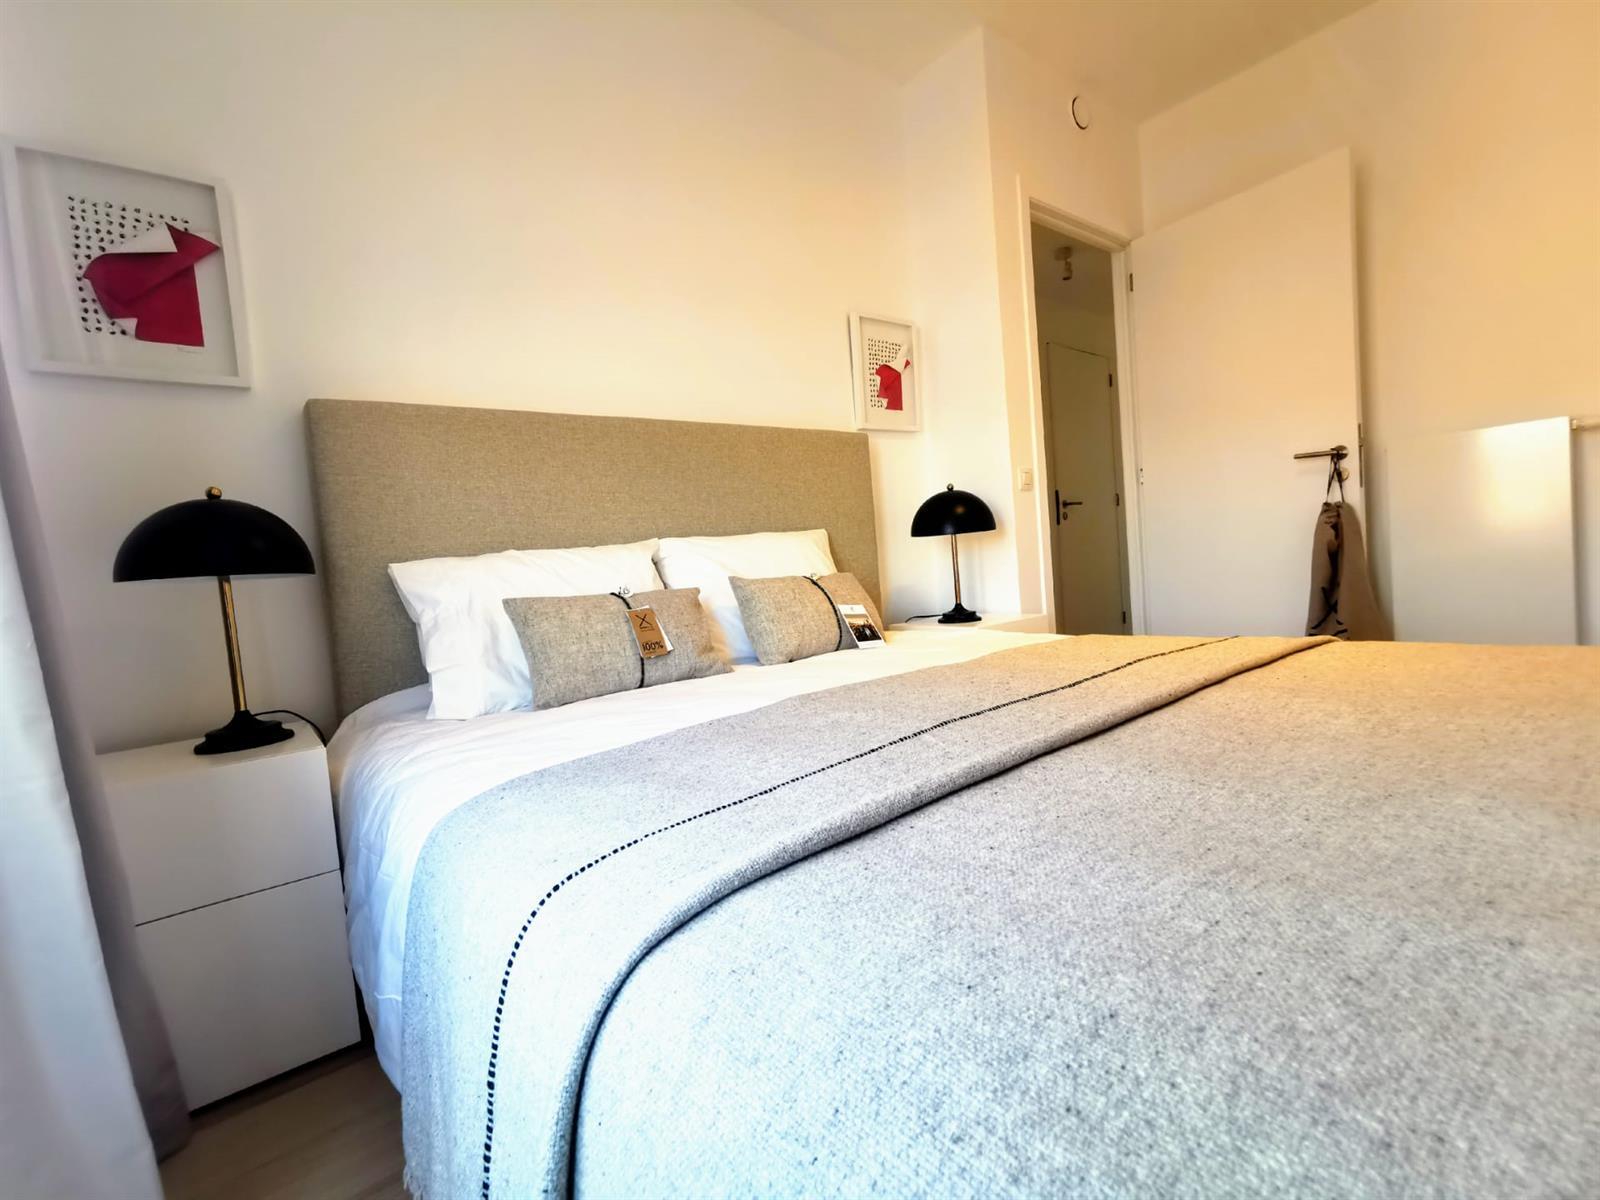 Appartement - Woluwe-Saint-Lambert - #4455516-9